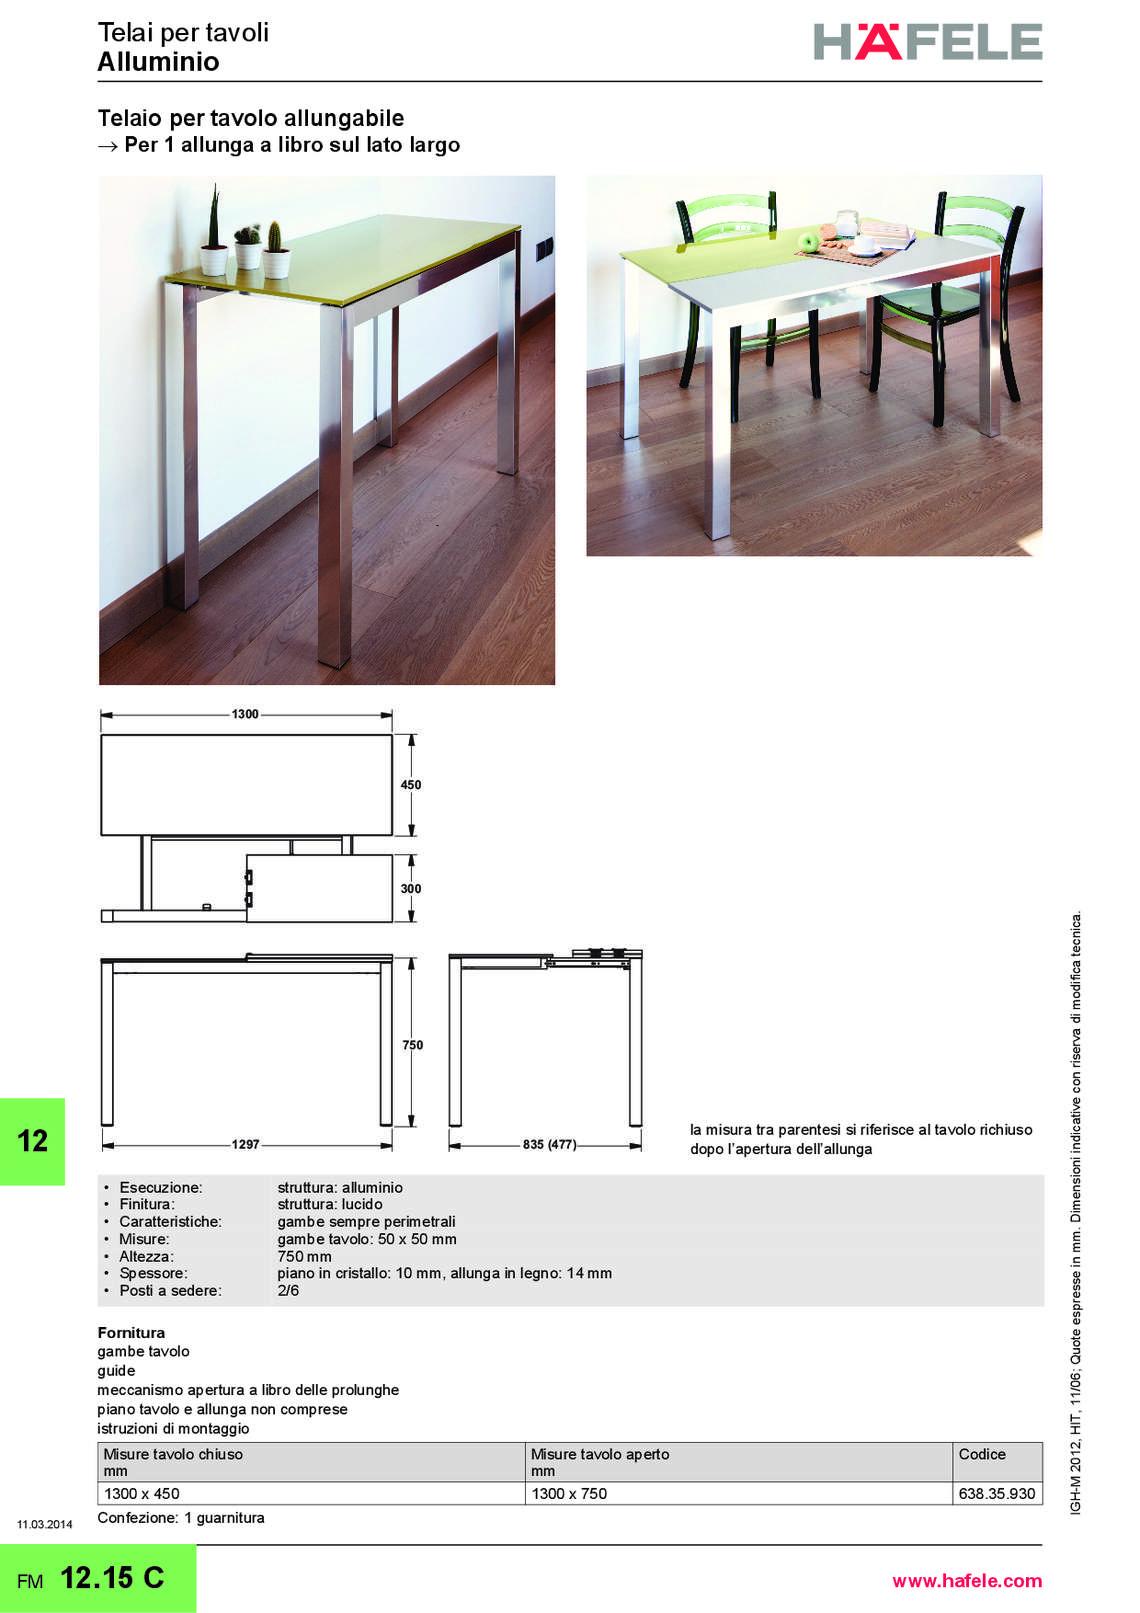 hafele-sottostrutture-per-mobili_83_029.jpg